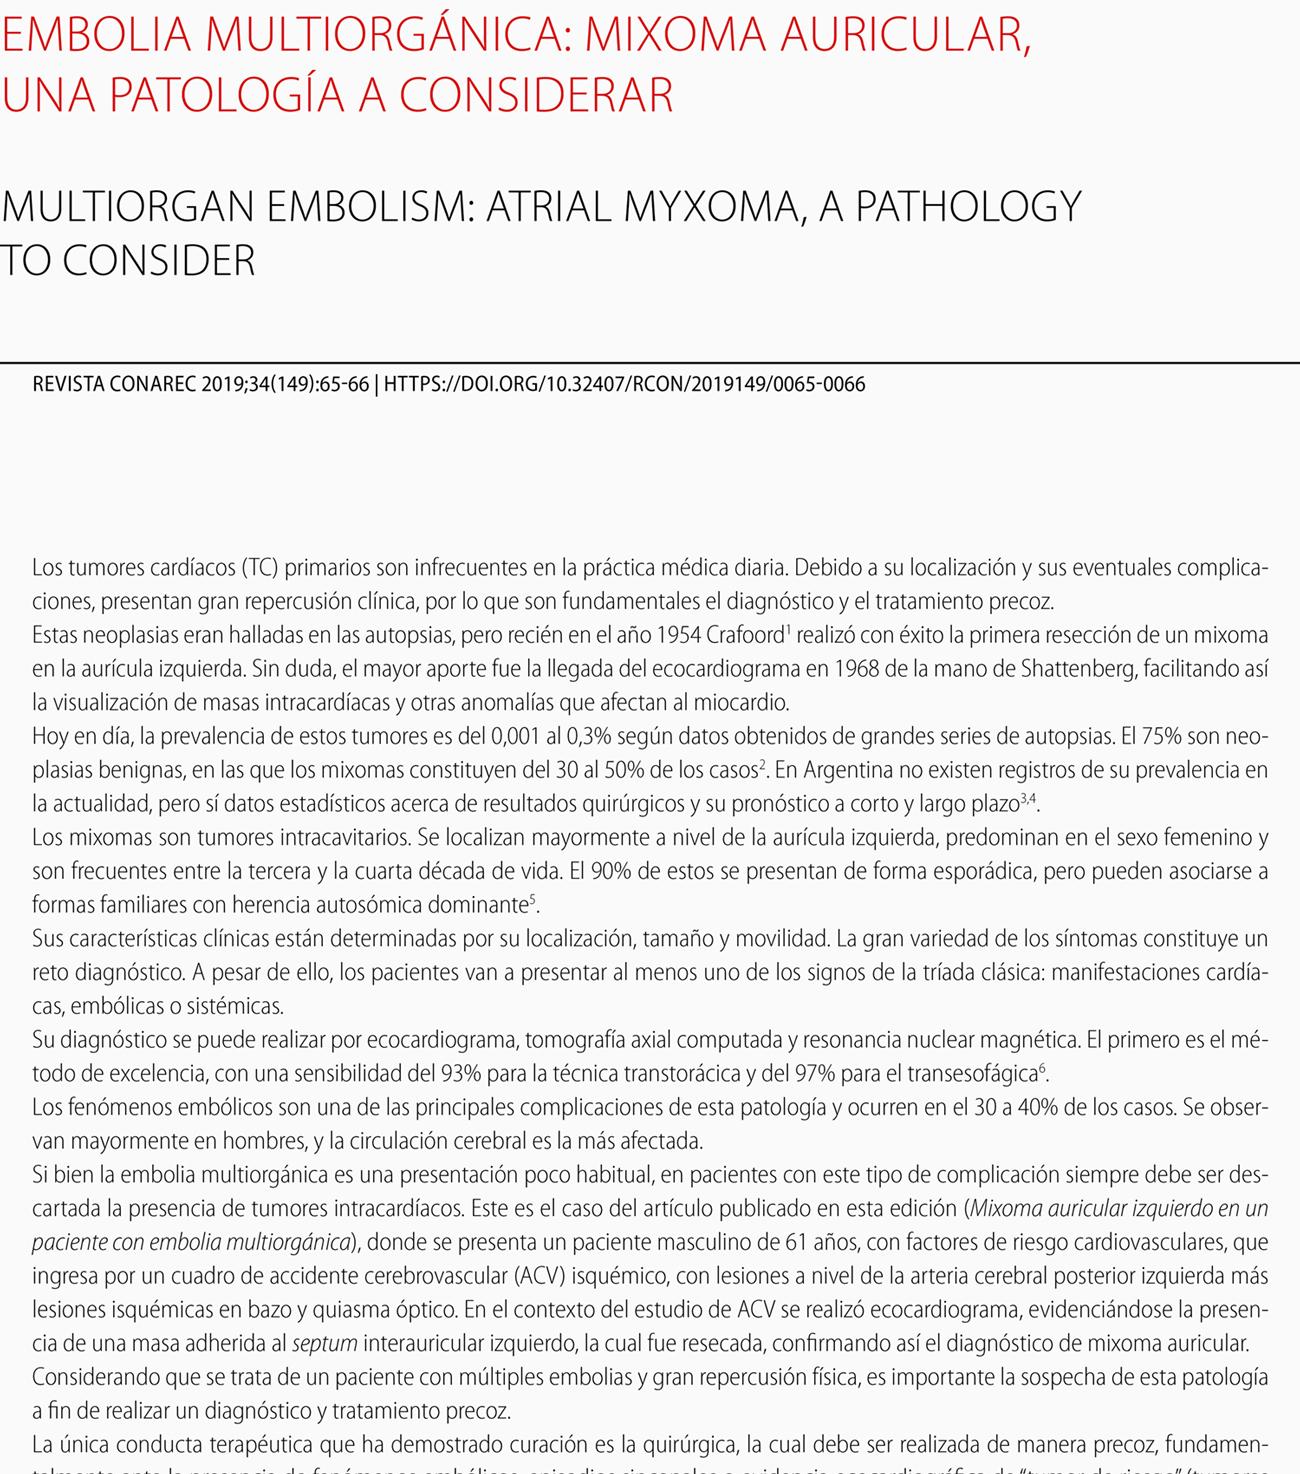 Embolia multiorgánica: mixoma auricular, una patología a considerar